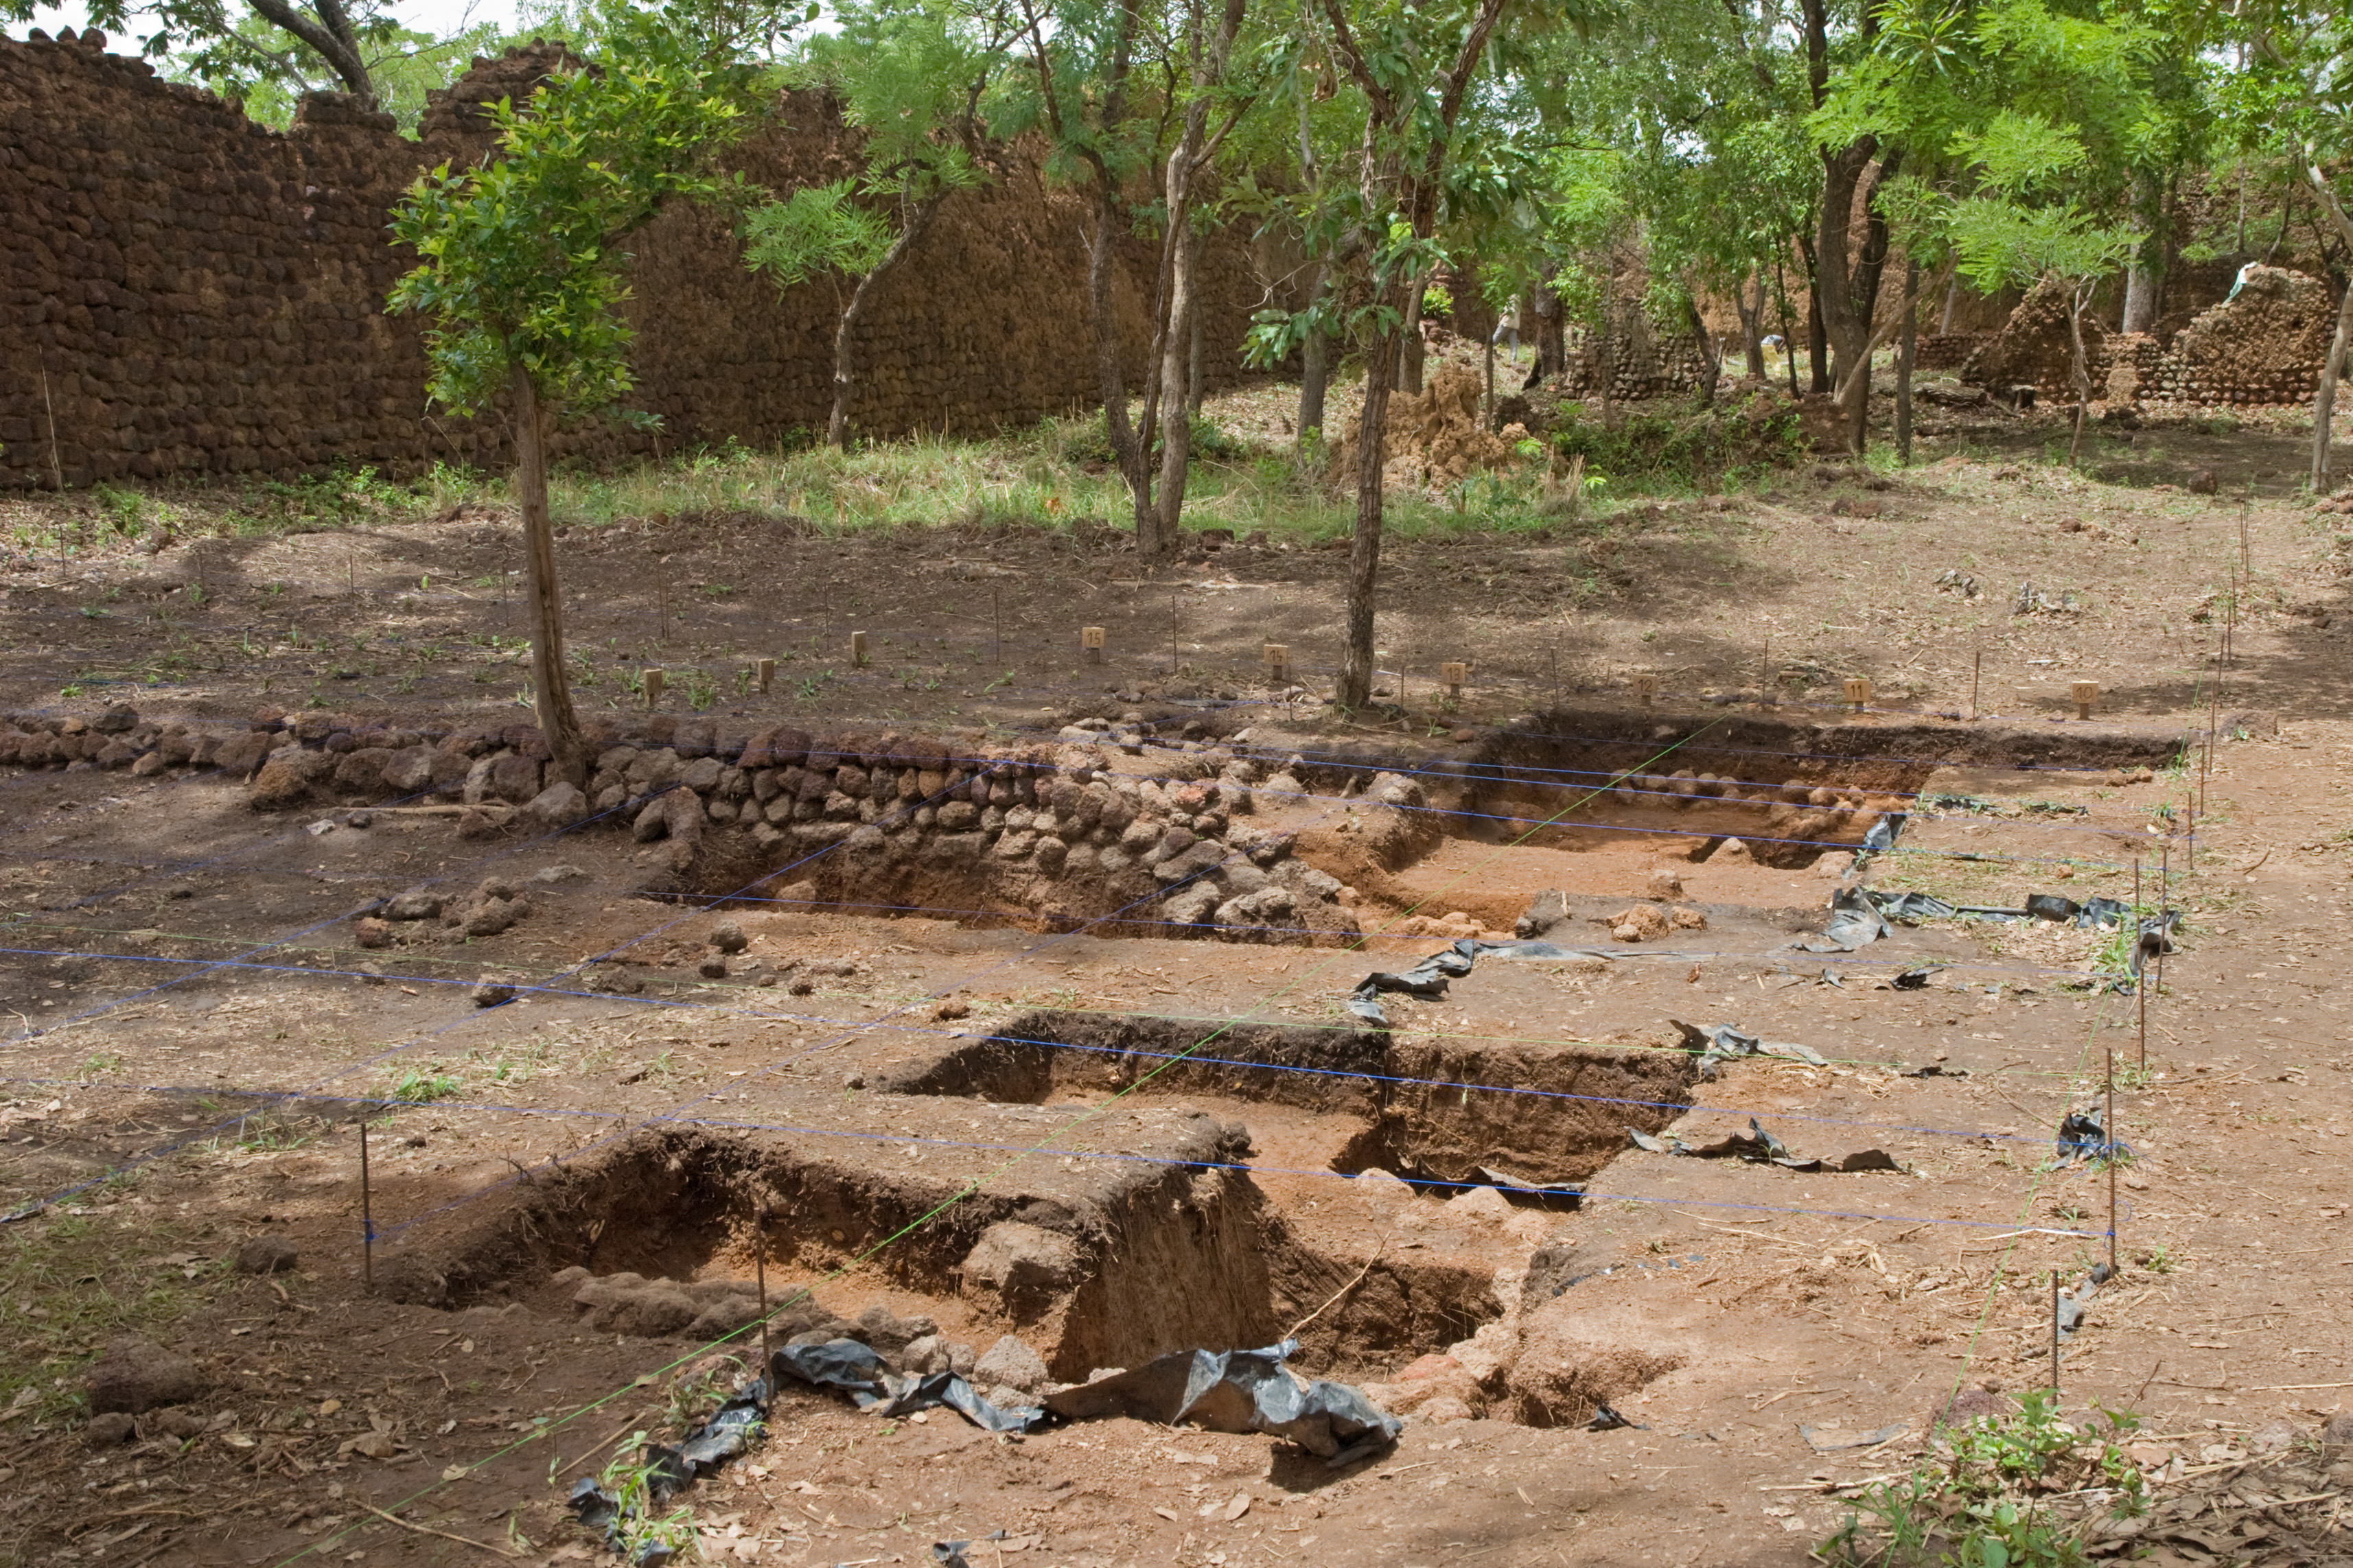 2016-05-441-134ap_archeologyexcavation_loropc3a9ni_ruins_nr-loropc3a9niponi_prv-bf_sun15may2016-1119h